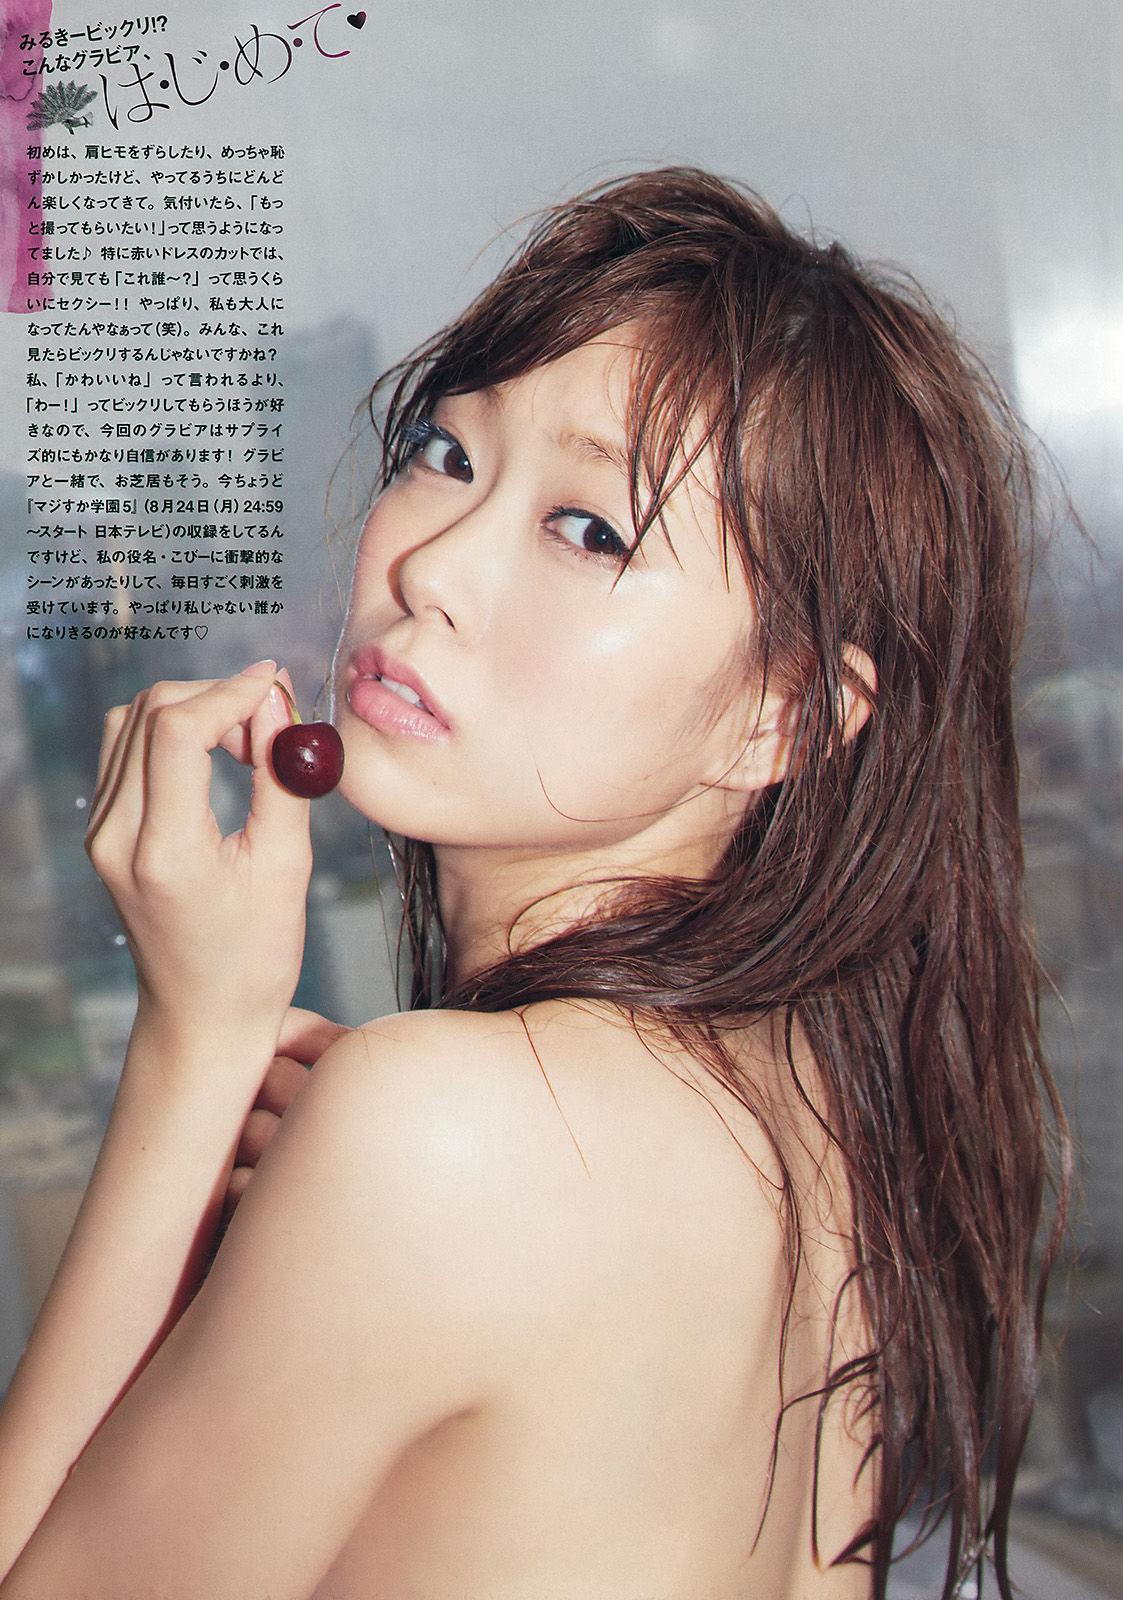 [Weekly Big Comic Spirits杂志写真]渡边美优纪超高清写真大图片(8P)|813热度